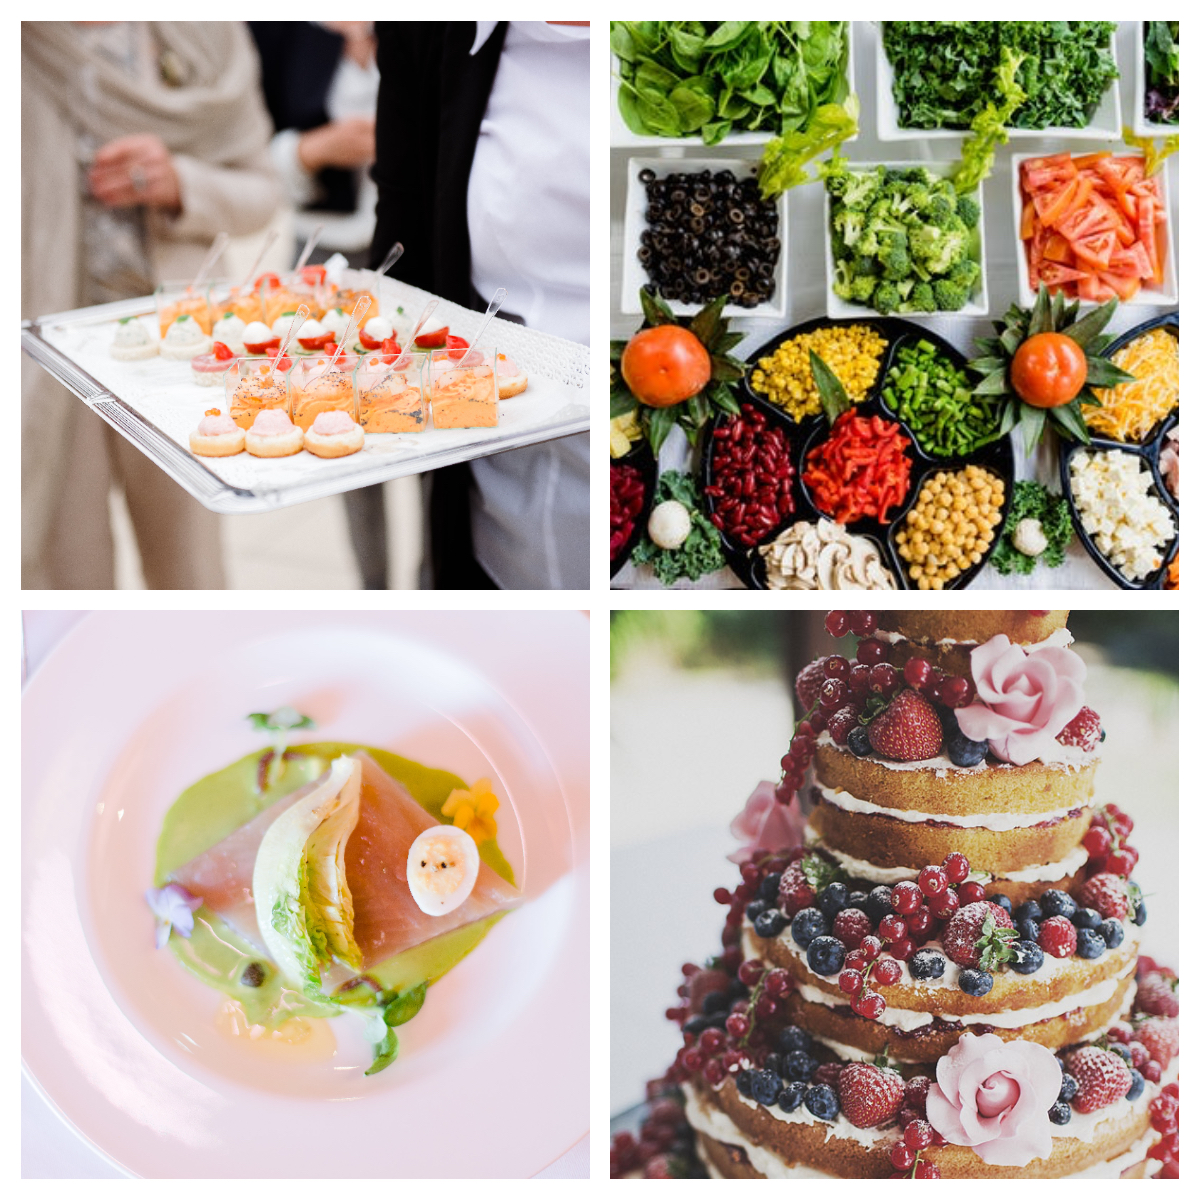 Food ideas for a spring wedding at Portes des Iris